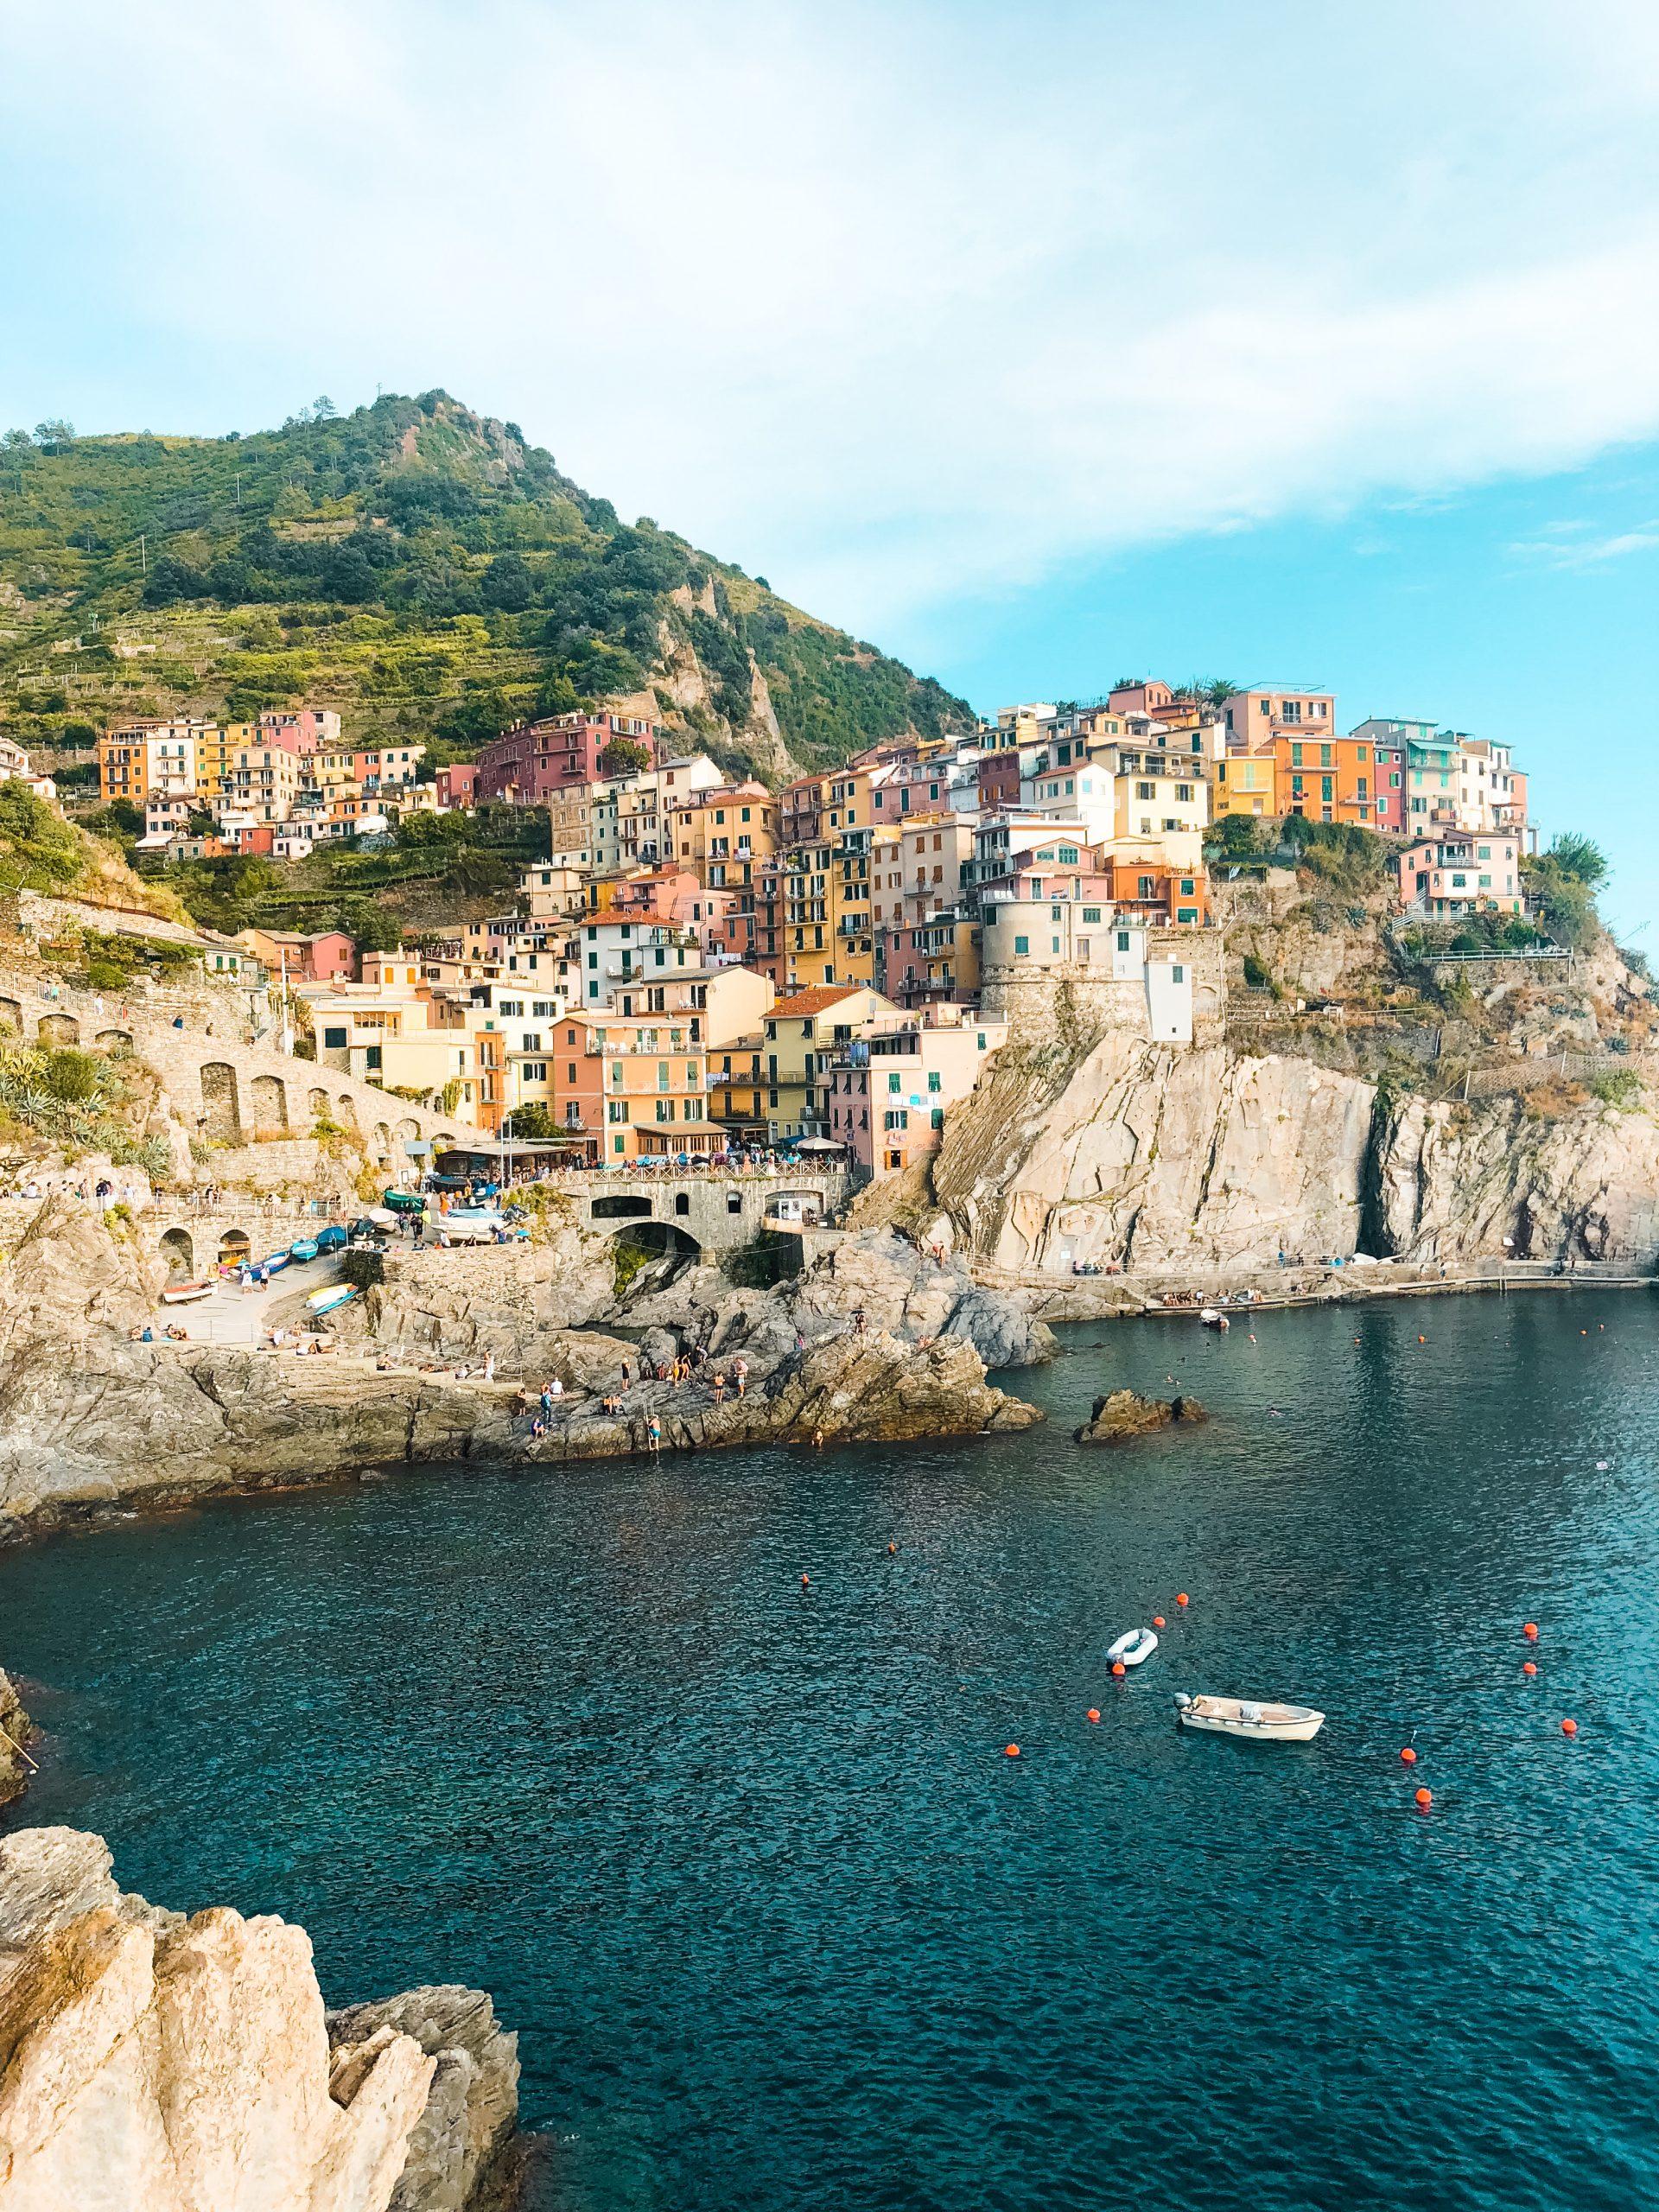 the coastline of Vernazza